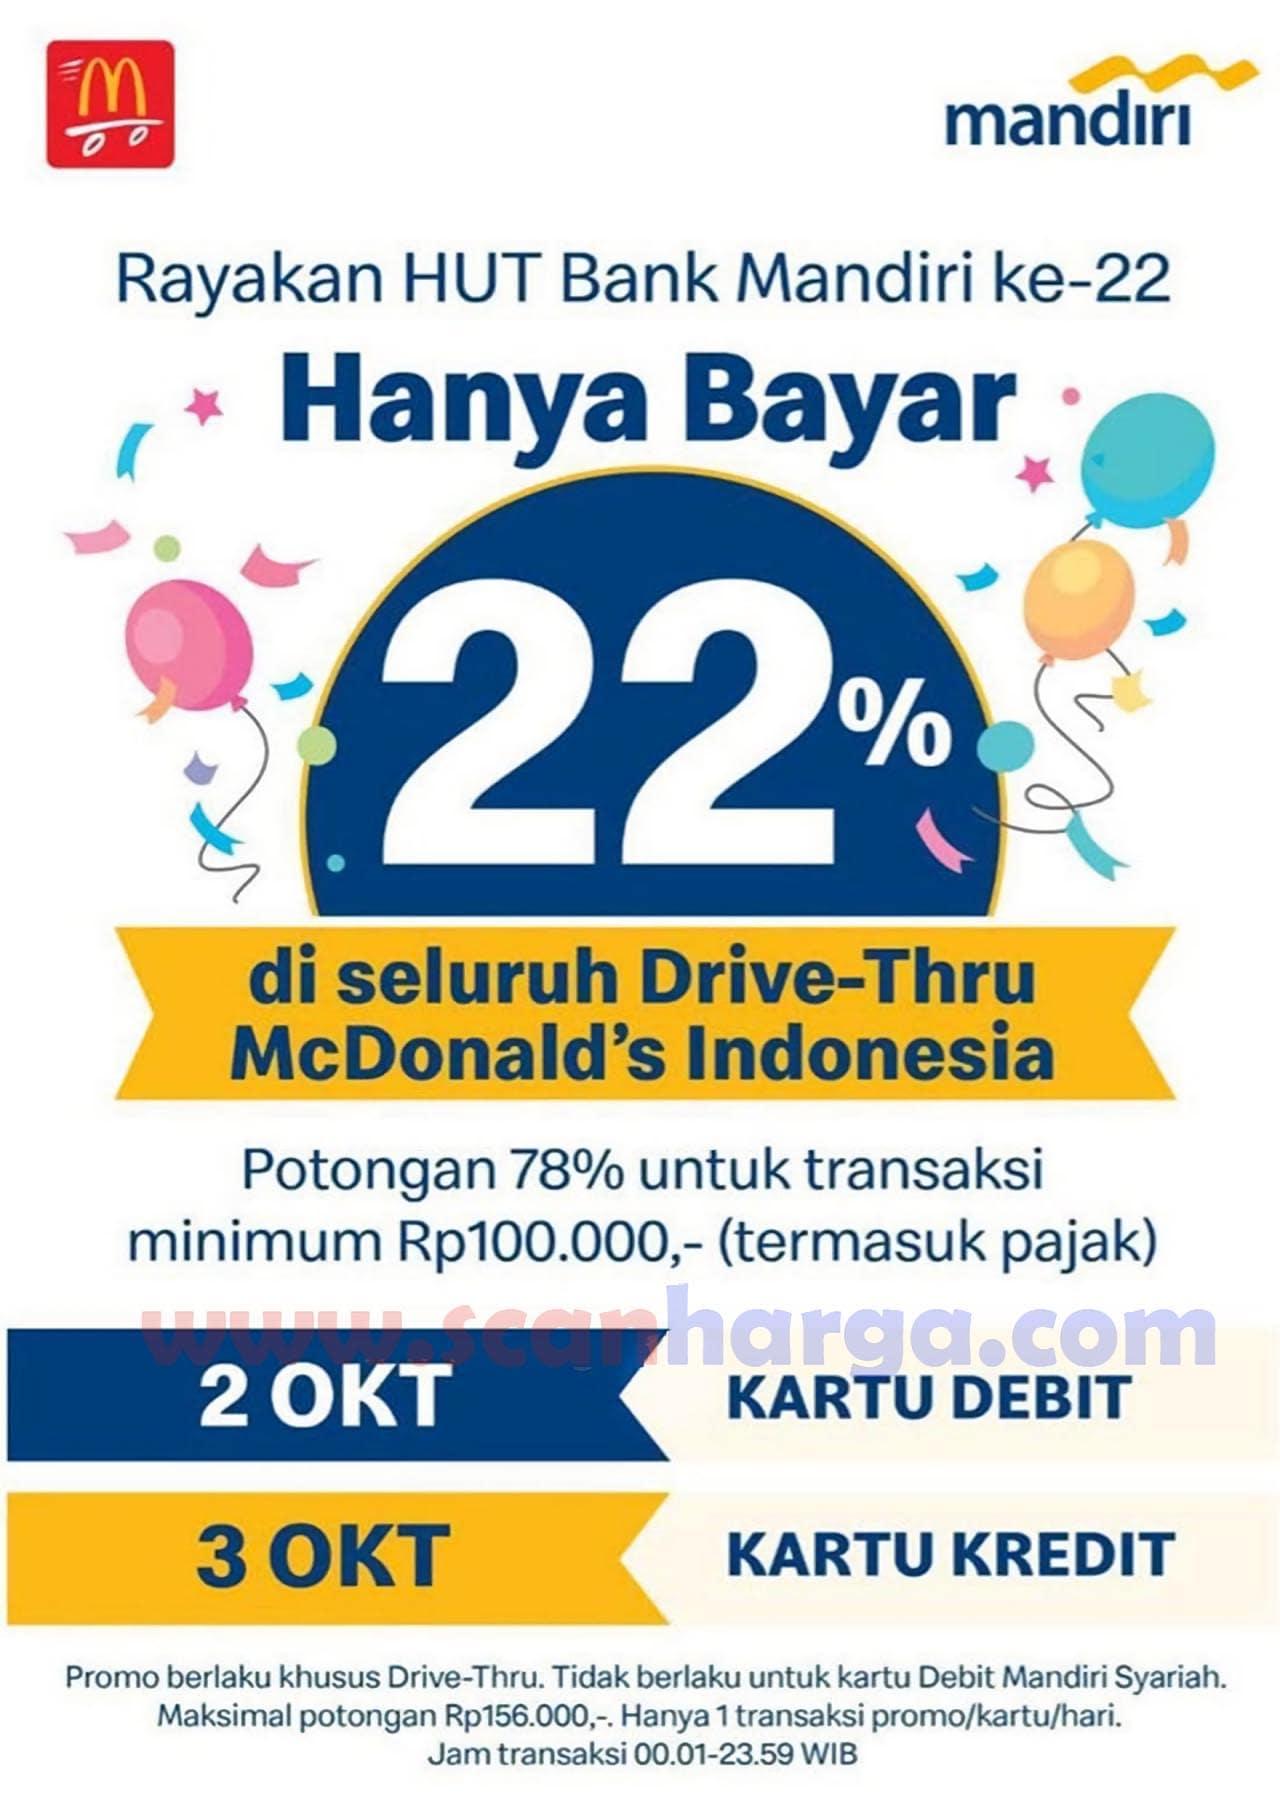 Promo McDonalds HUT MANDIRI Ke-22 Diskon 78% via DriveThru pakai Kartu Kredit /Debit Mandiri*